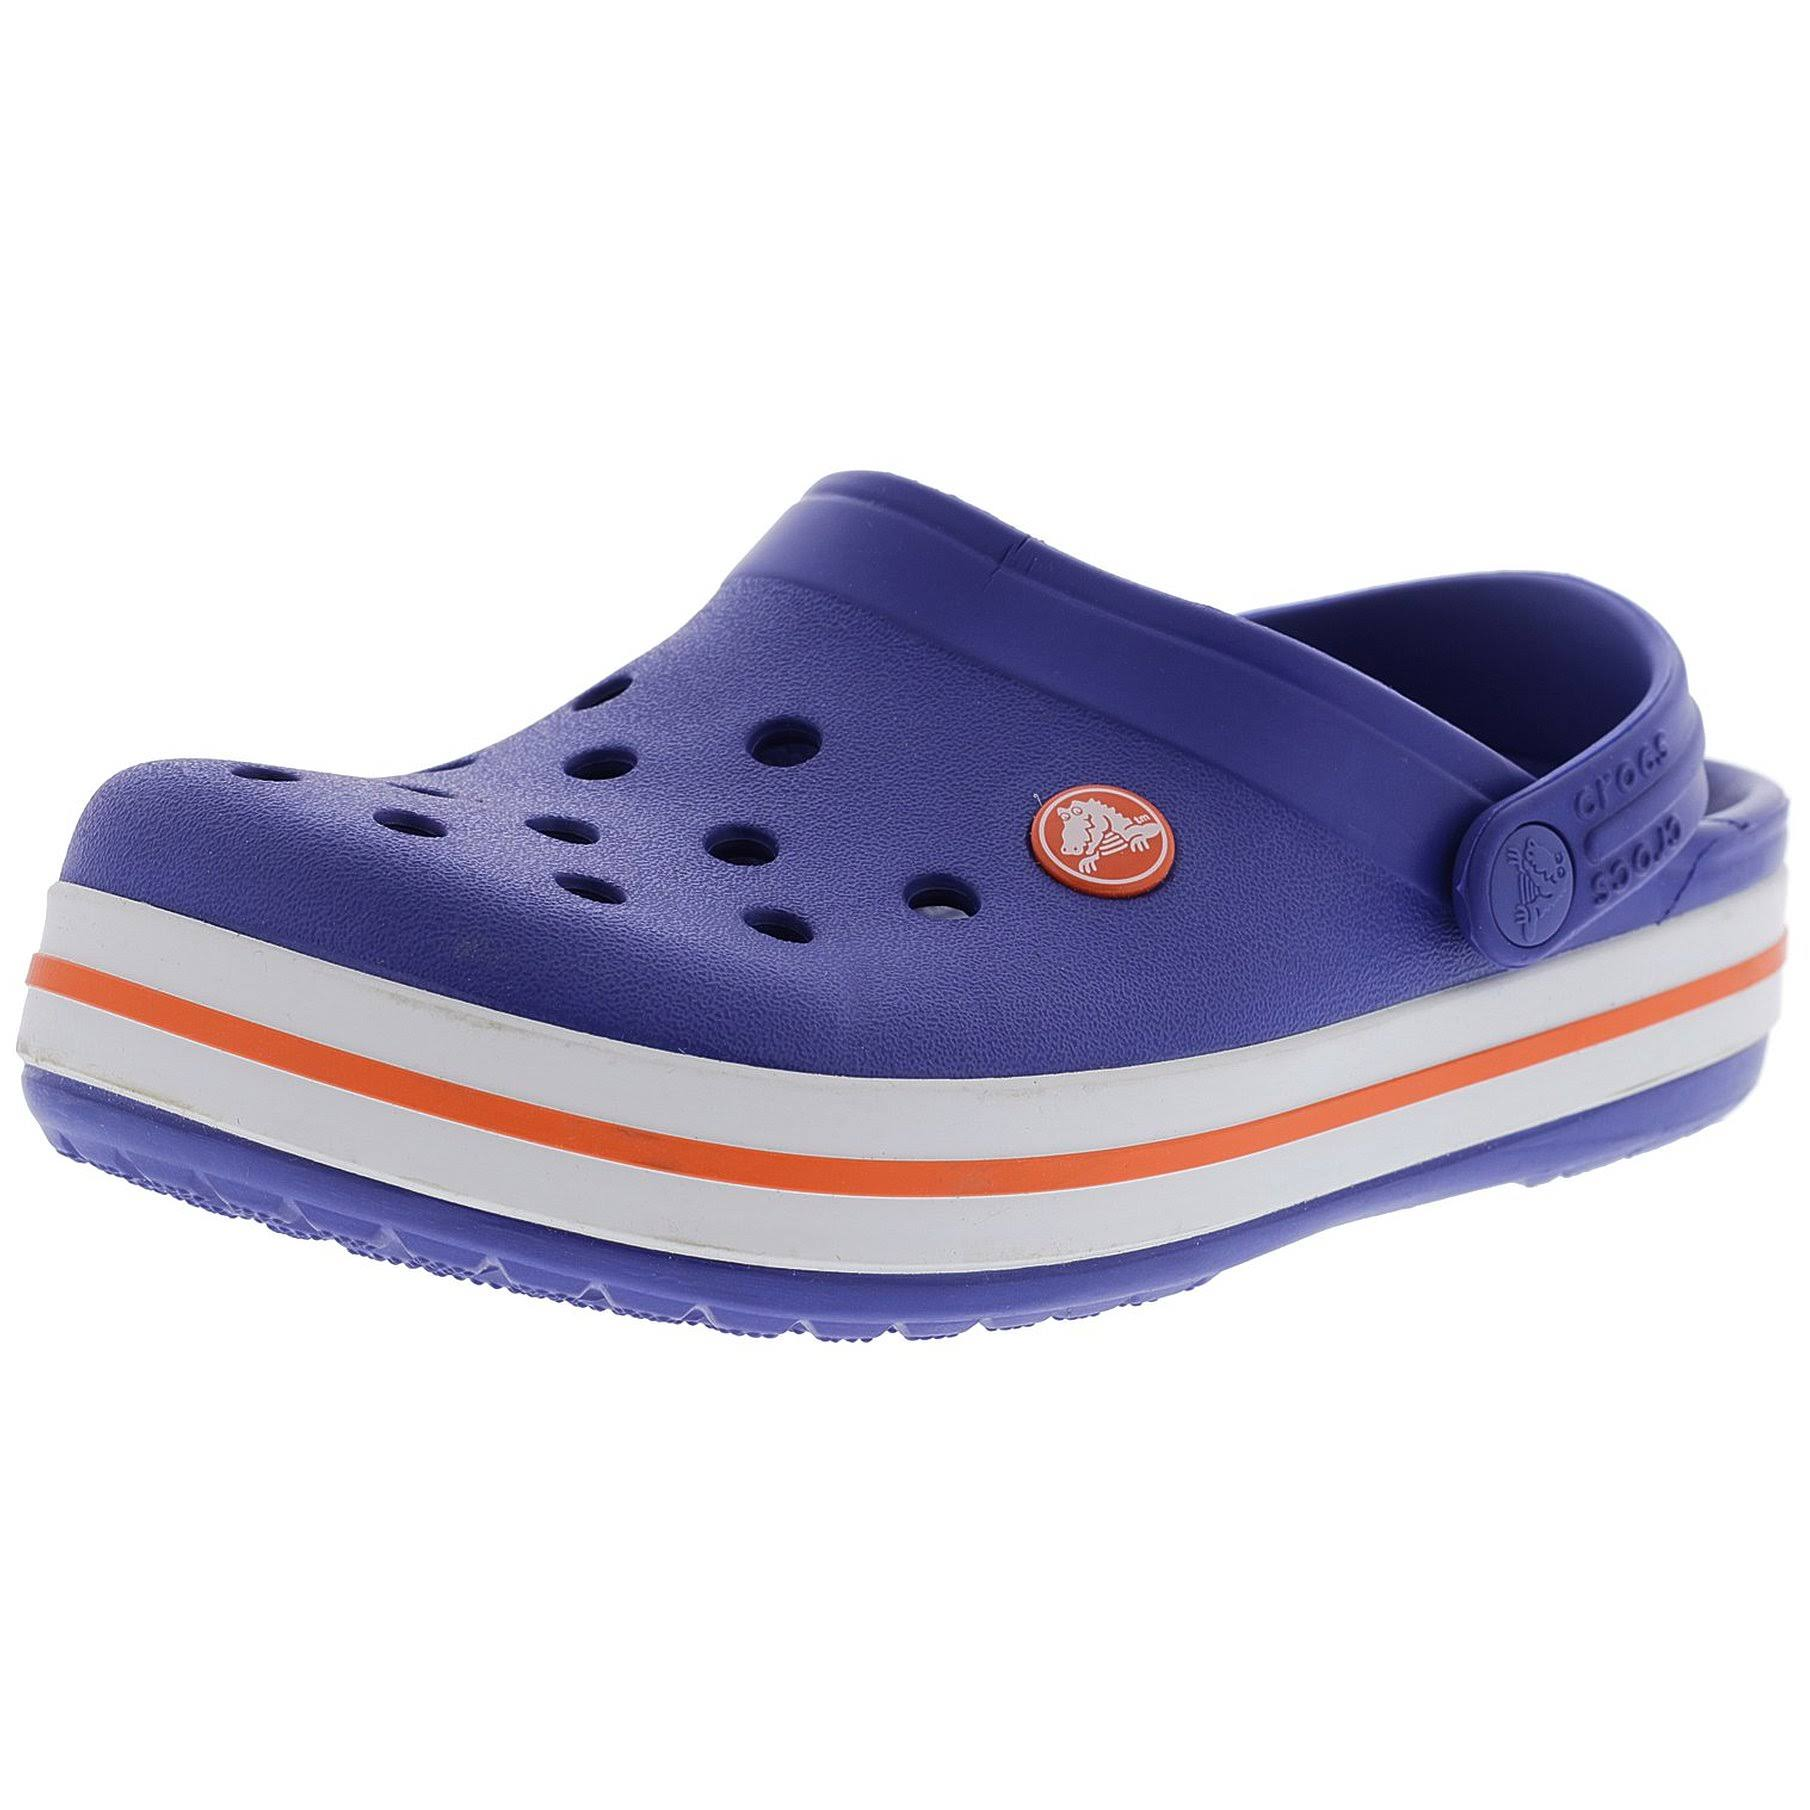 Niño Cerulean Clog Blue Ltd Zuecos Kids 10m Crocband Crocs wqxnn8XRg